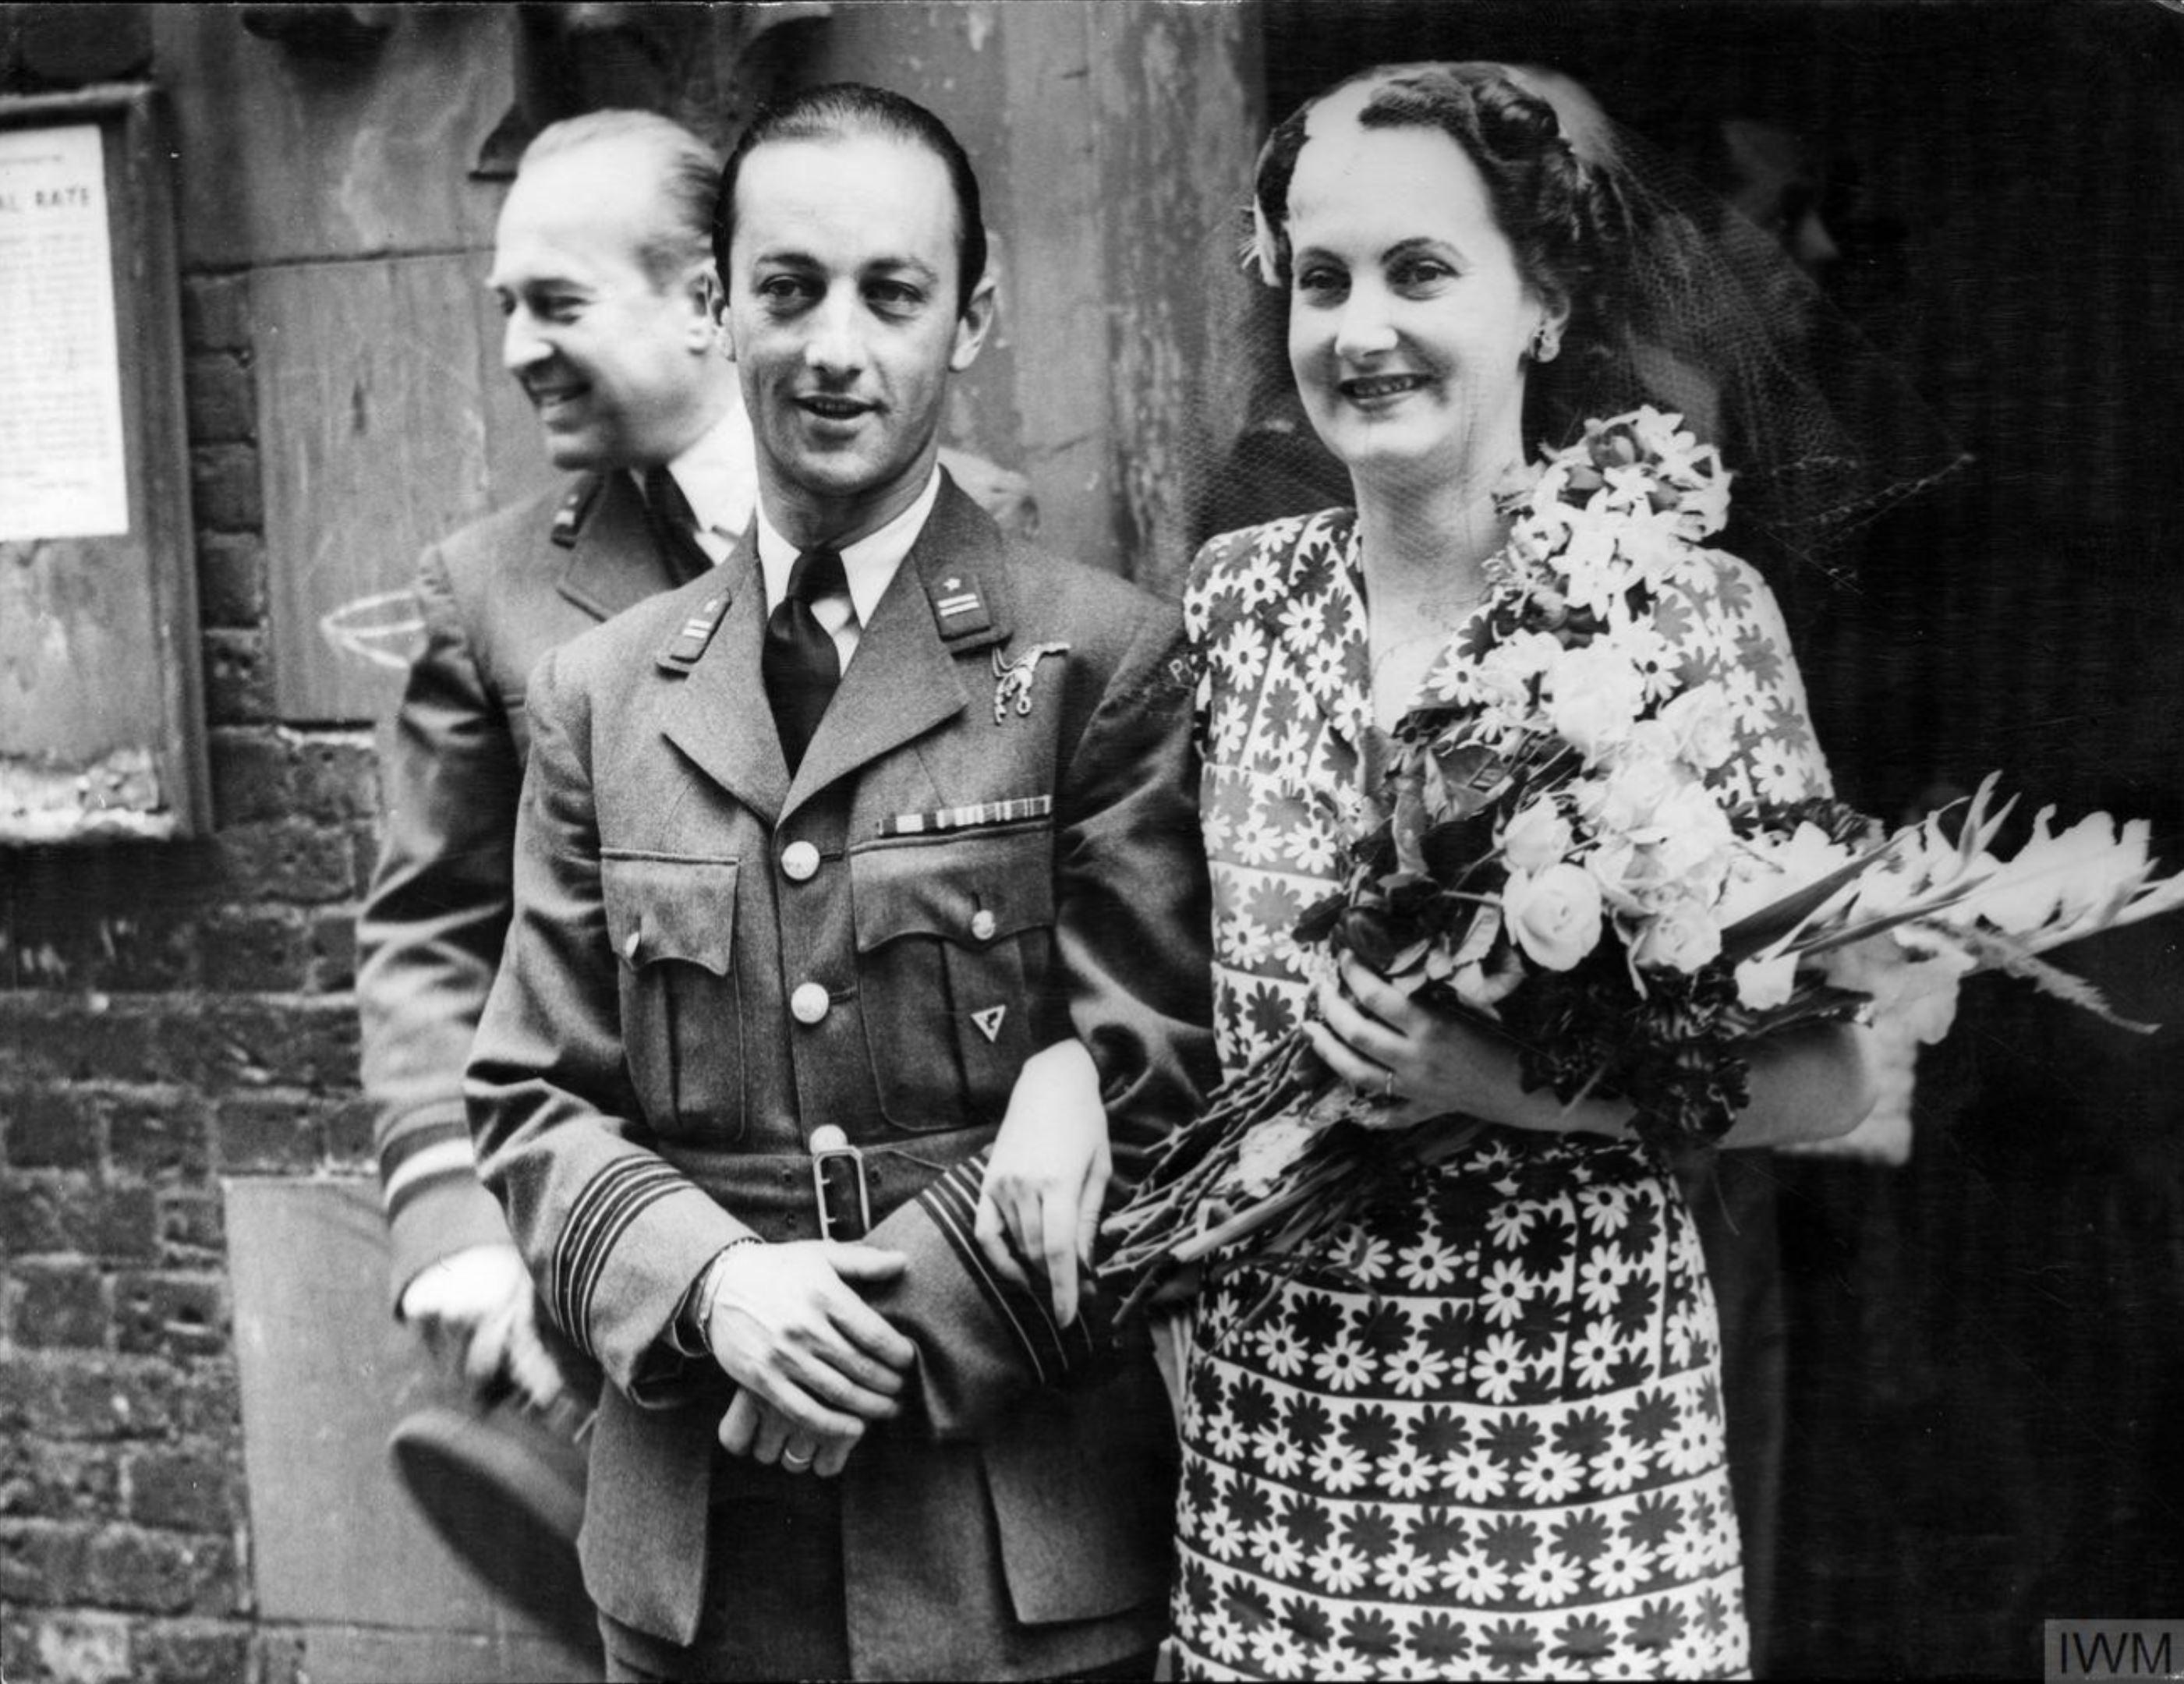 Aircrew RAF 303Sqn (Polish) pilots at Tadeusz Sawicz wedding ceremony 24 Aug 1944 IWM HU128081